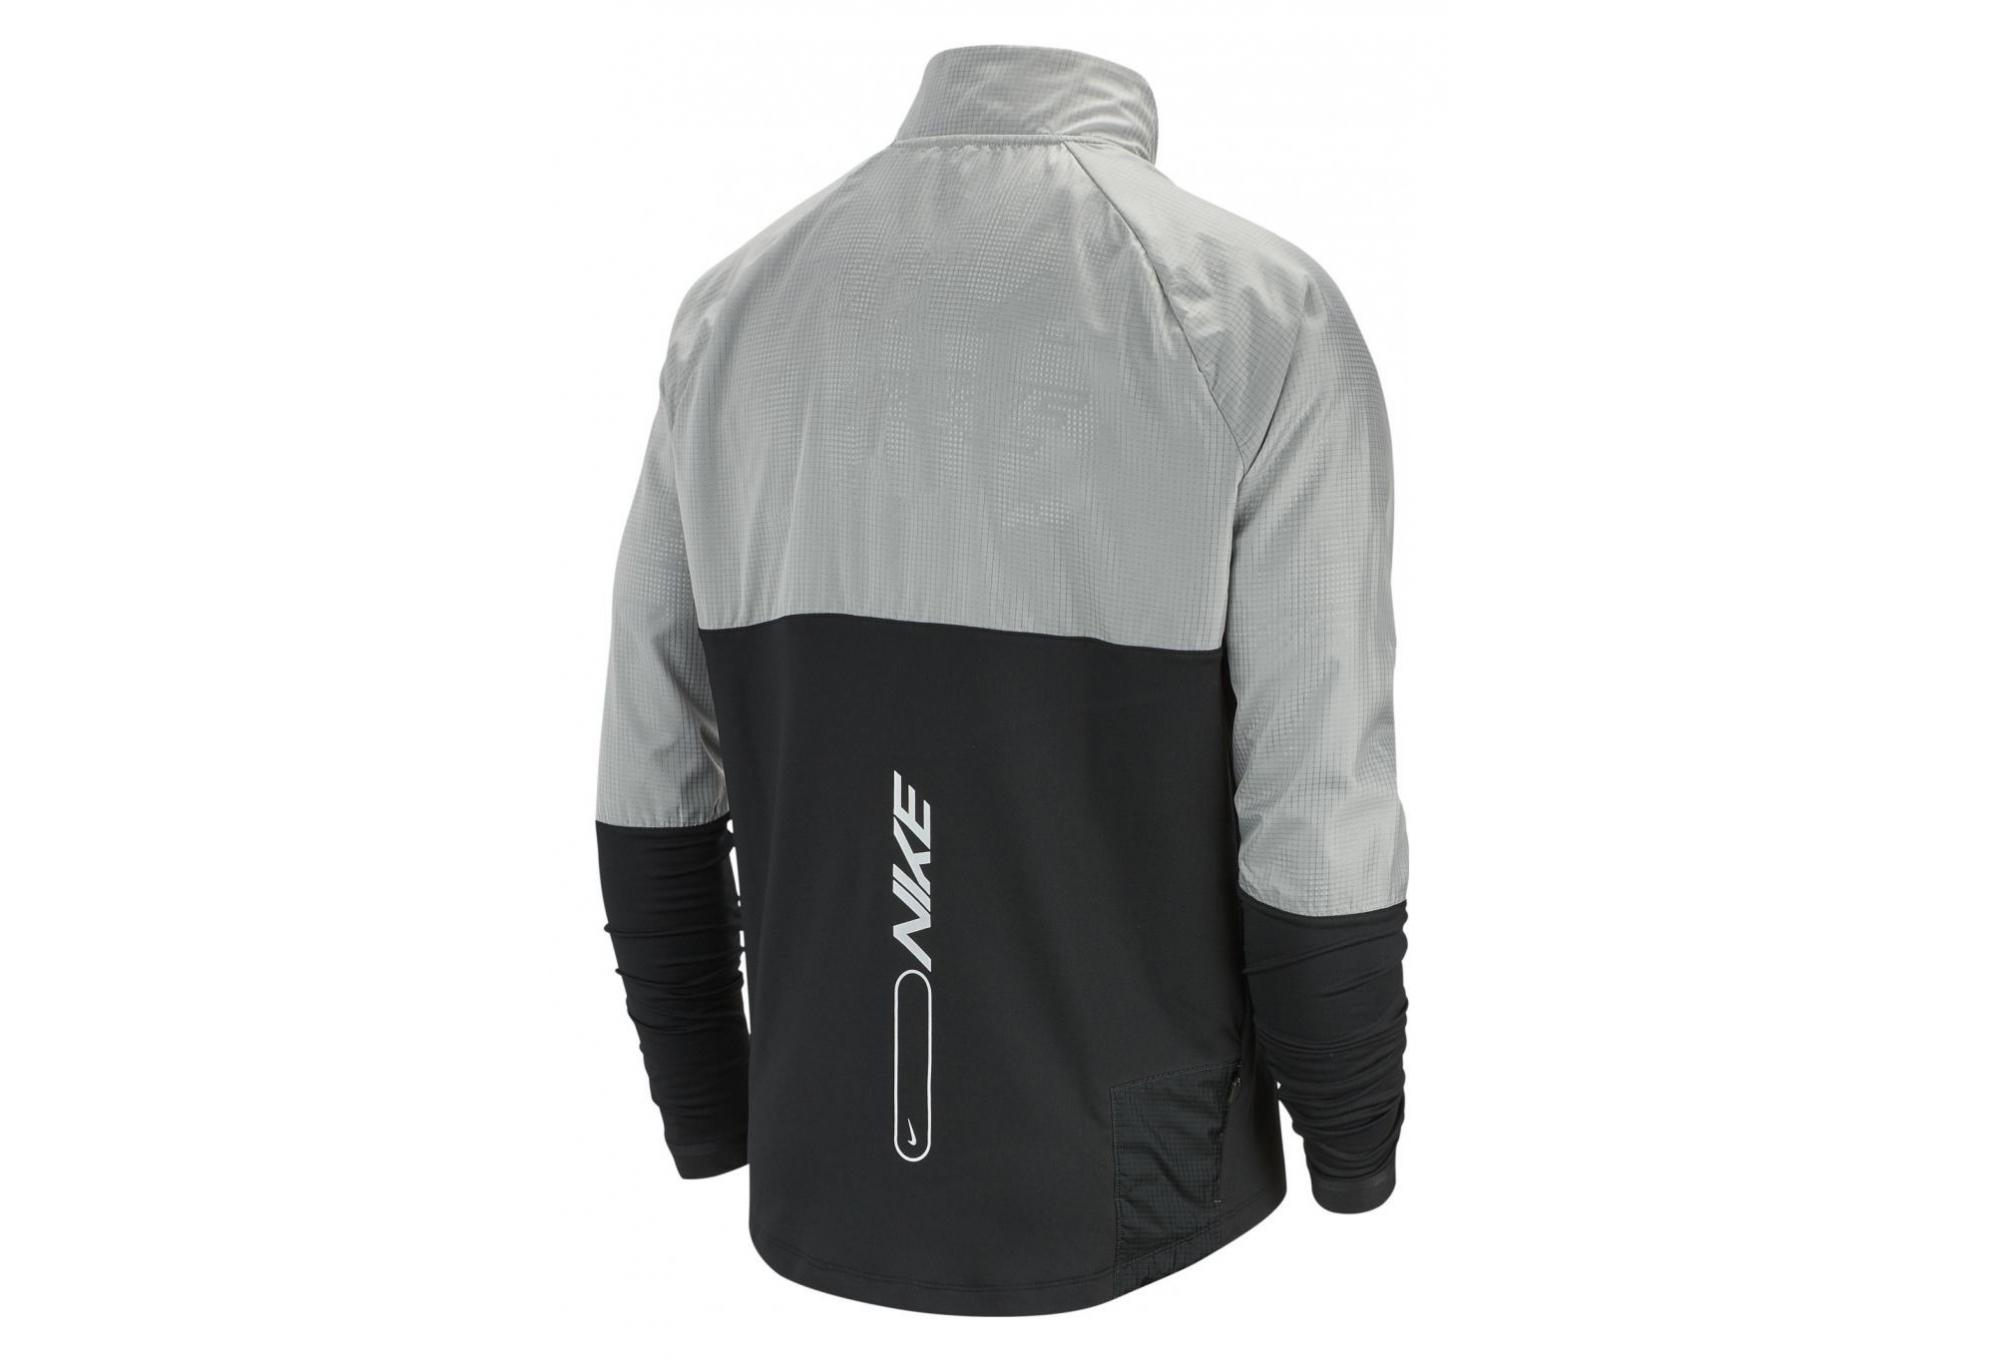 uk store 50% price on sale Veste Coupe-vent Nike Element 3.0 Noir Blanc Homme